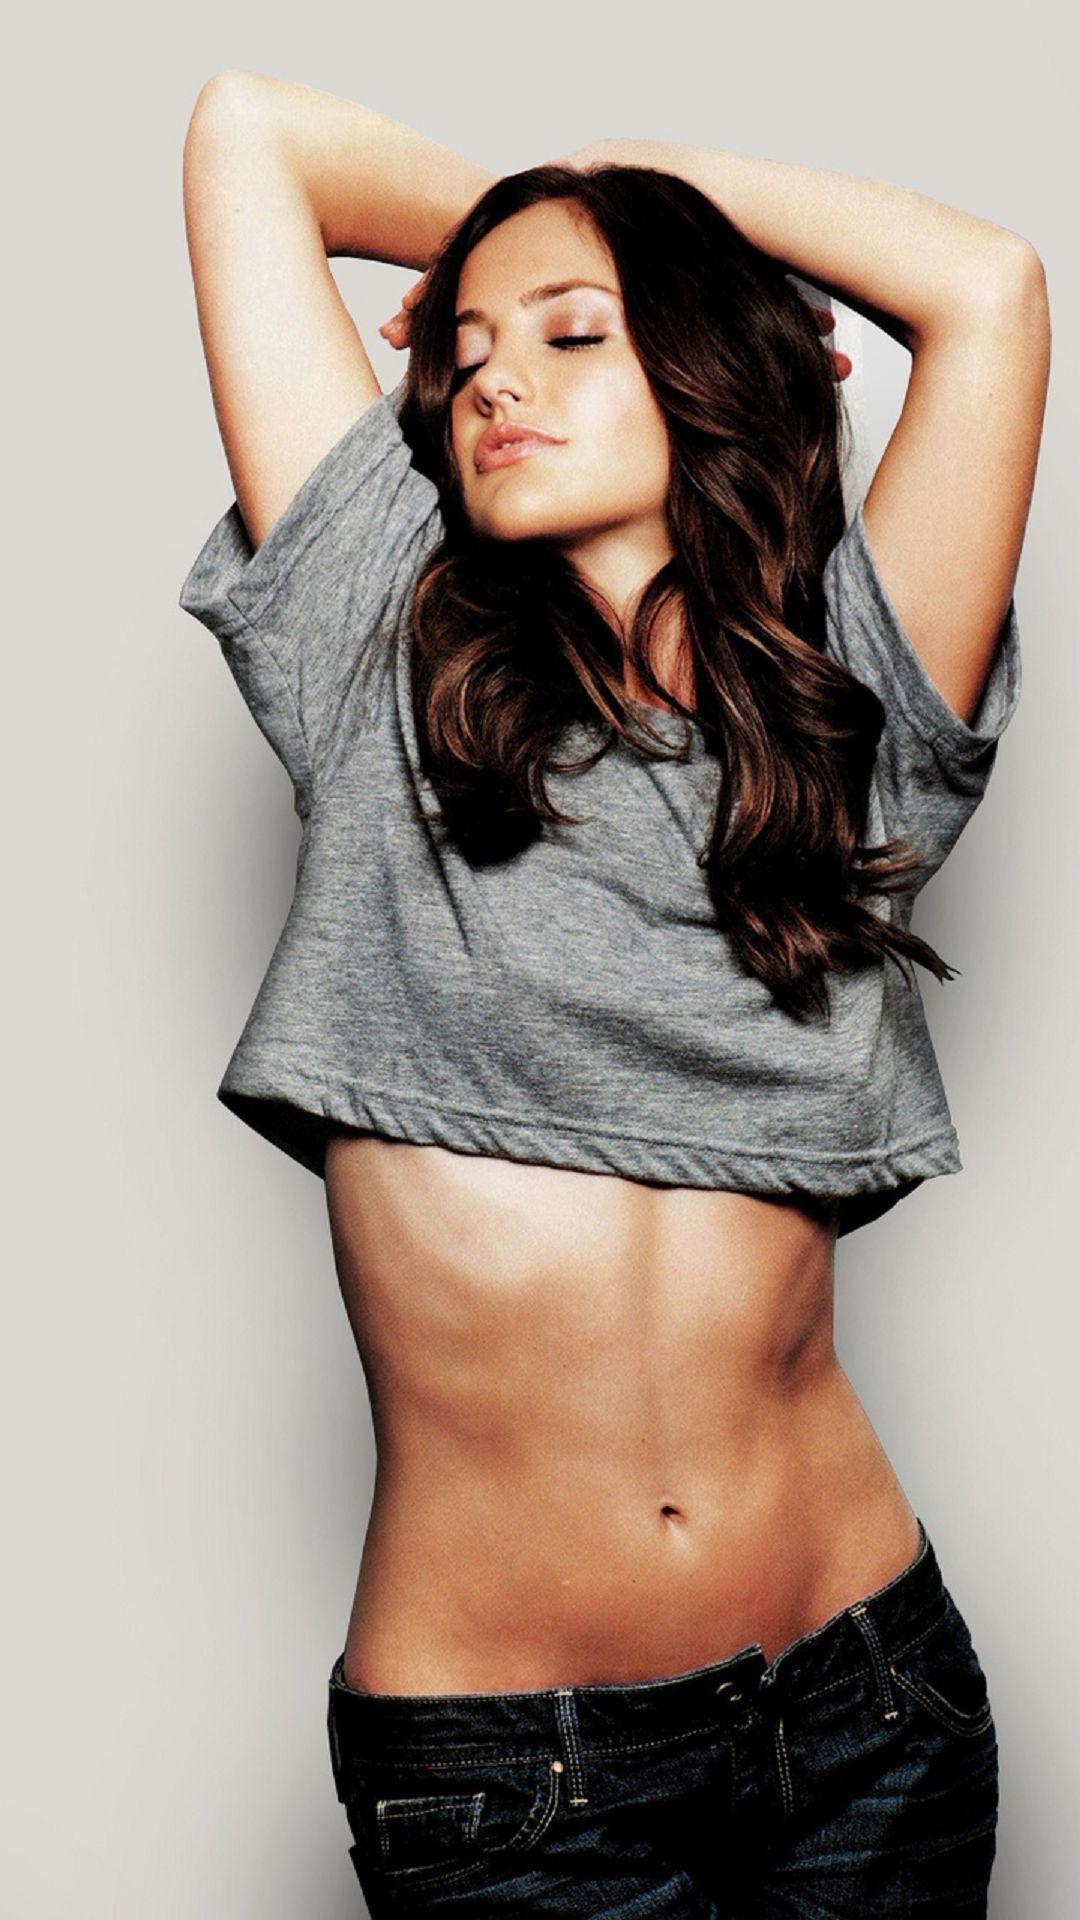 minka kelly hot actress #iphone #6 #wallpaper   iphone 6 wallpapers